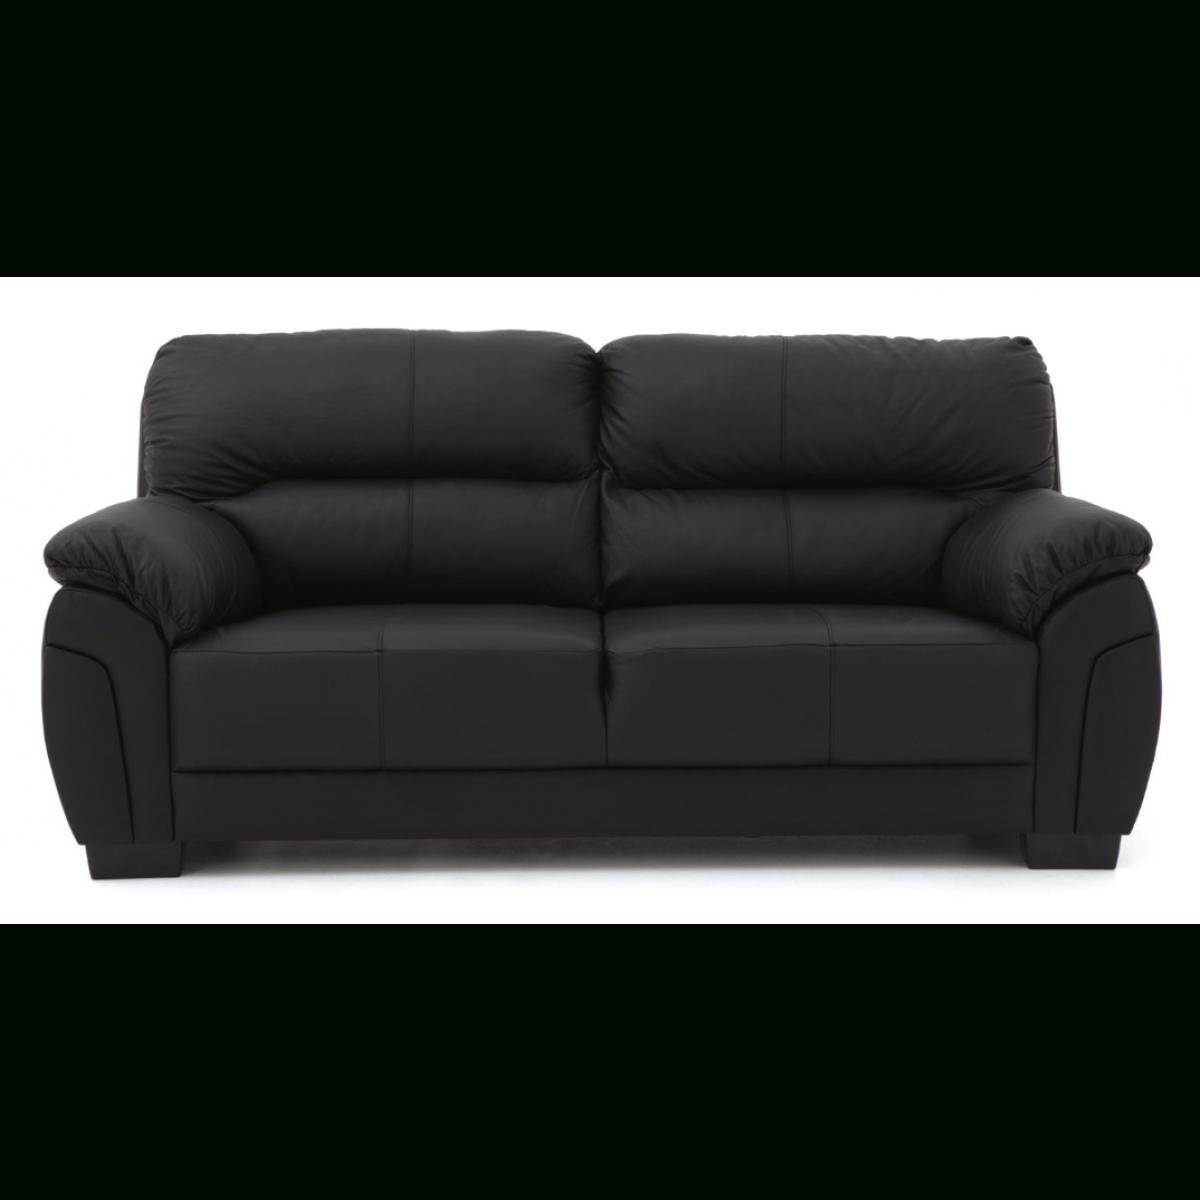 Favorite Black 2 Seater Sofas In Ancona 3 Seater Plus 2 Seater Sofa Set Black – Furnico Village (View 11 of 15)